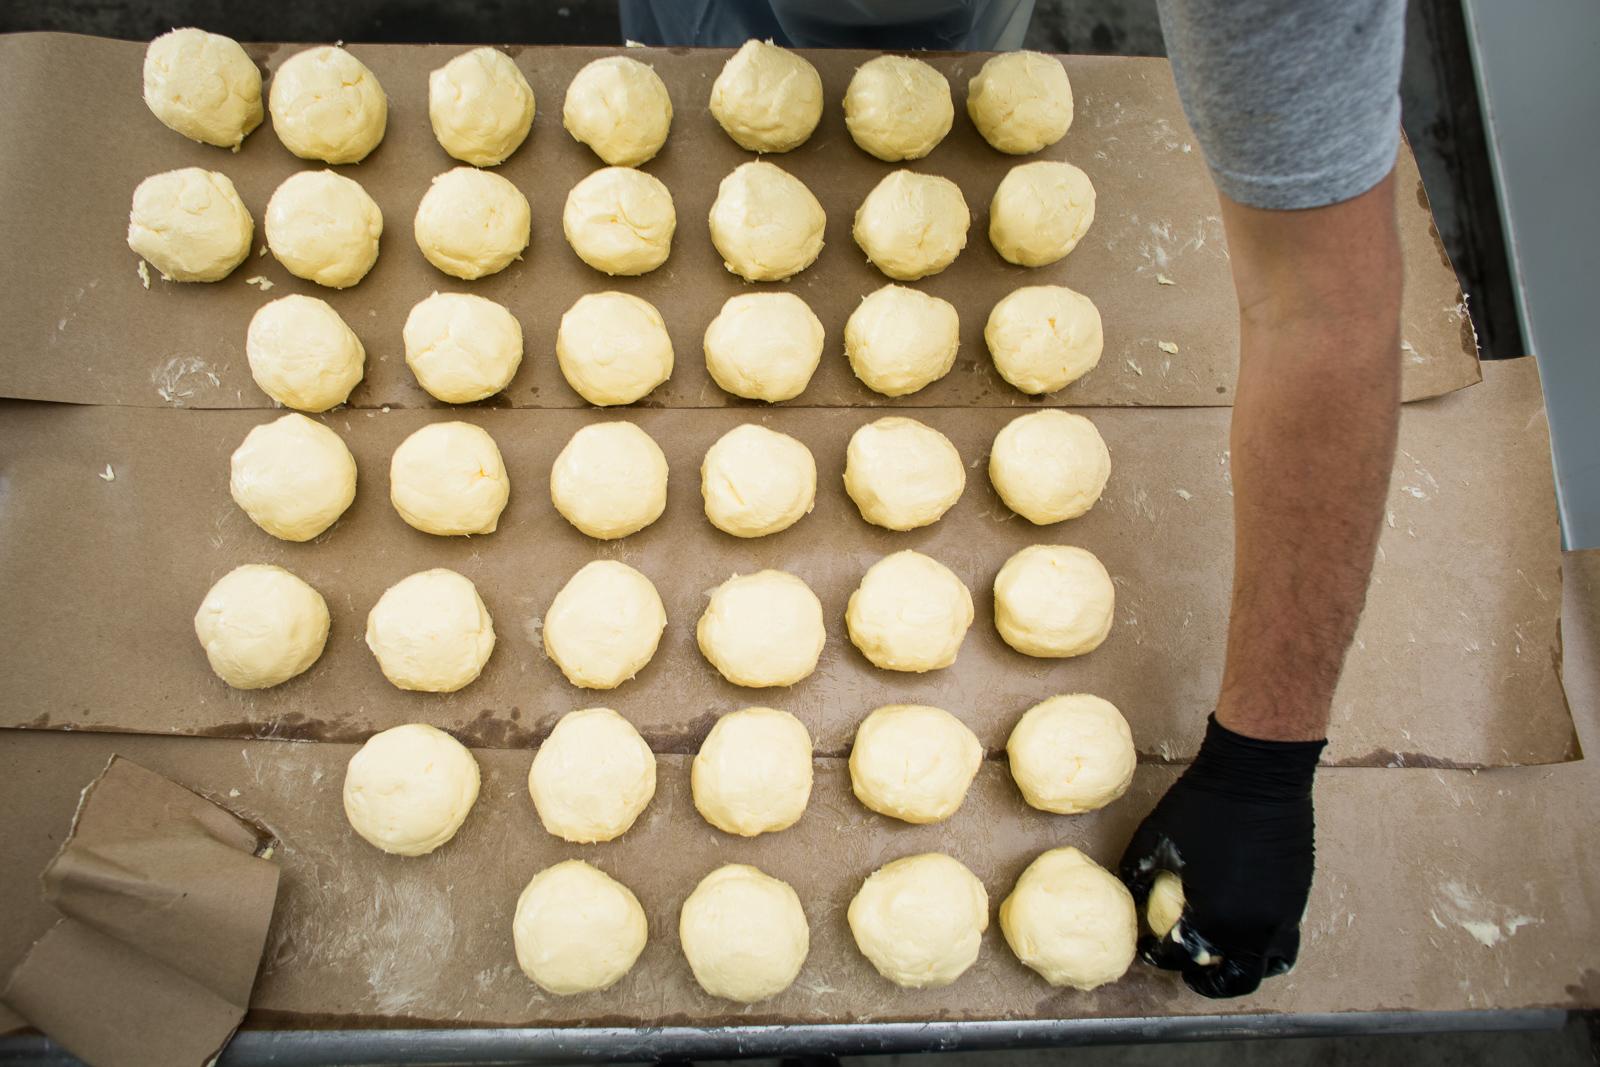 Ed LASTNAME makes butter for Ploughgate Creamery at Bragg Farm in Fayston, Vermont.